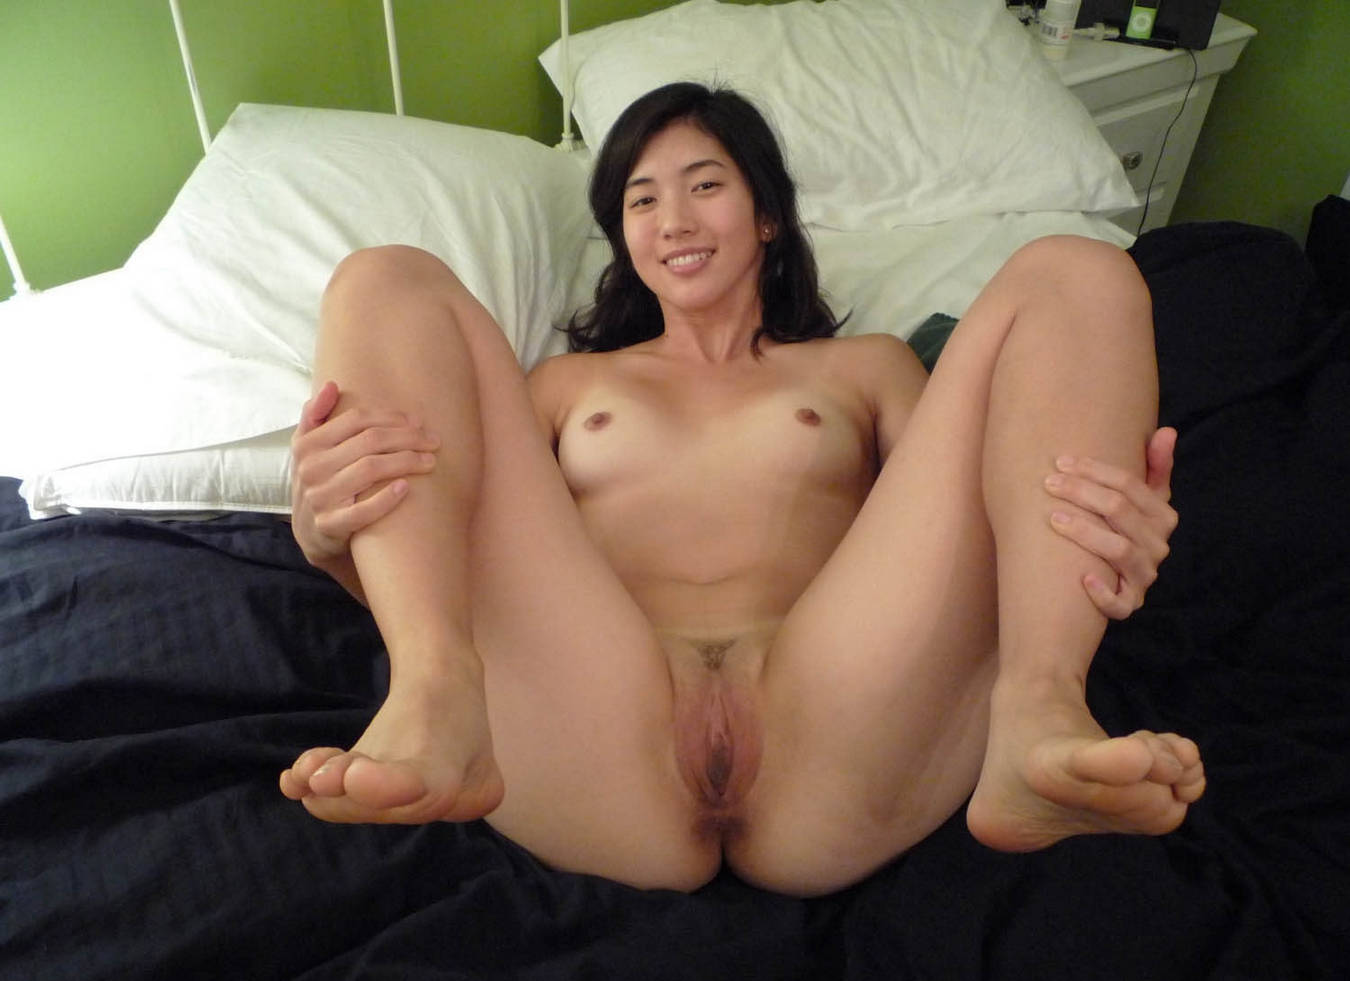 Nude Singapore Babes